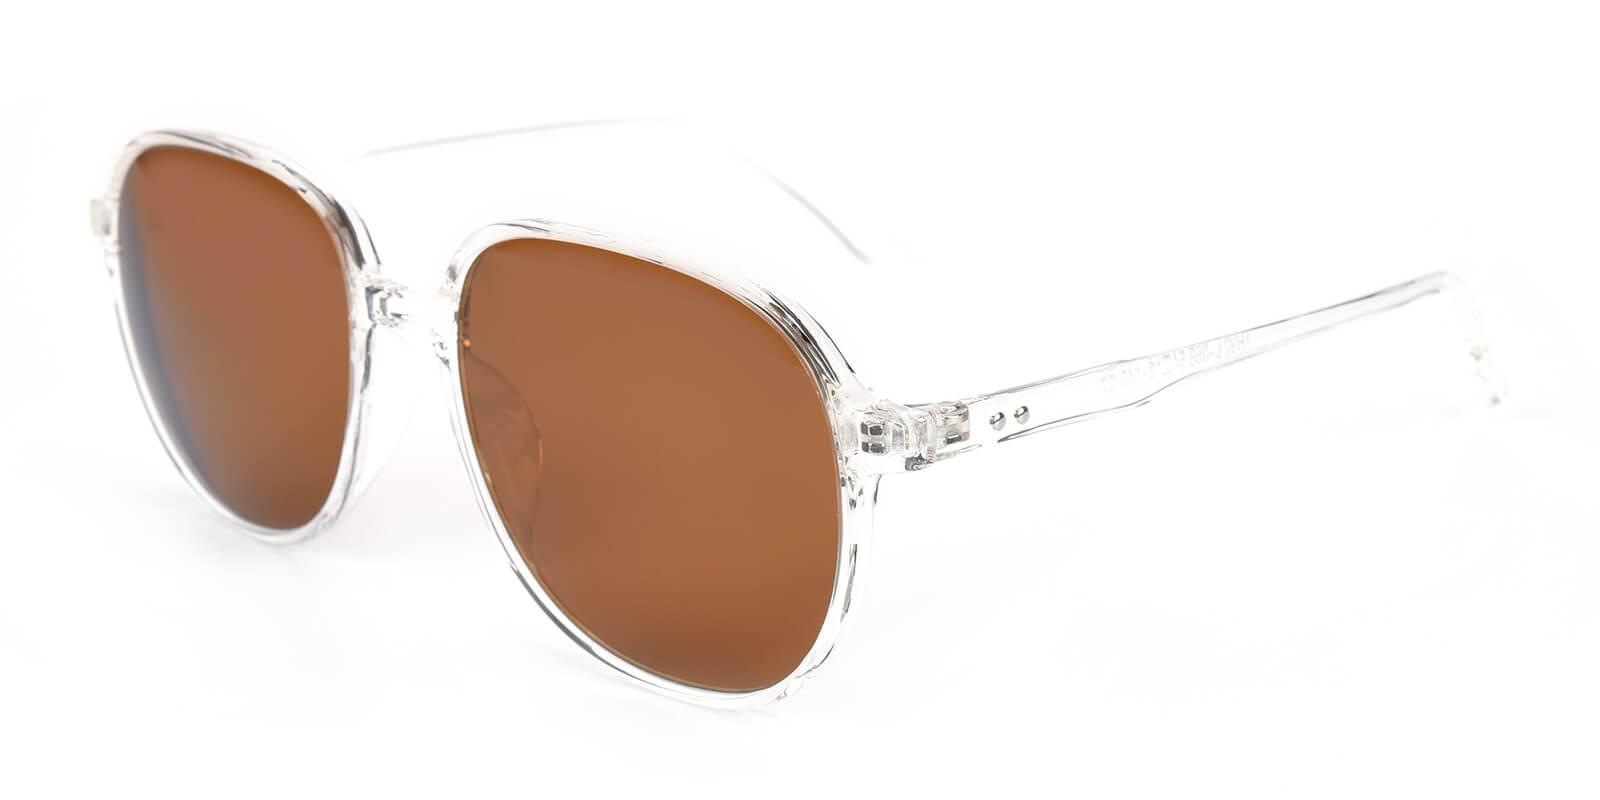 Alinena-Translucent-Round-TR-Sunglasses-additional1